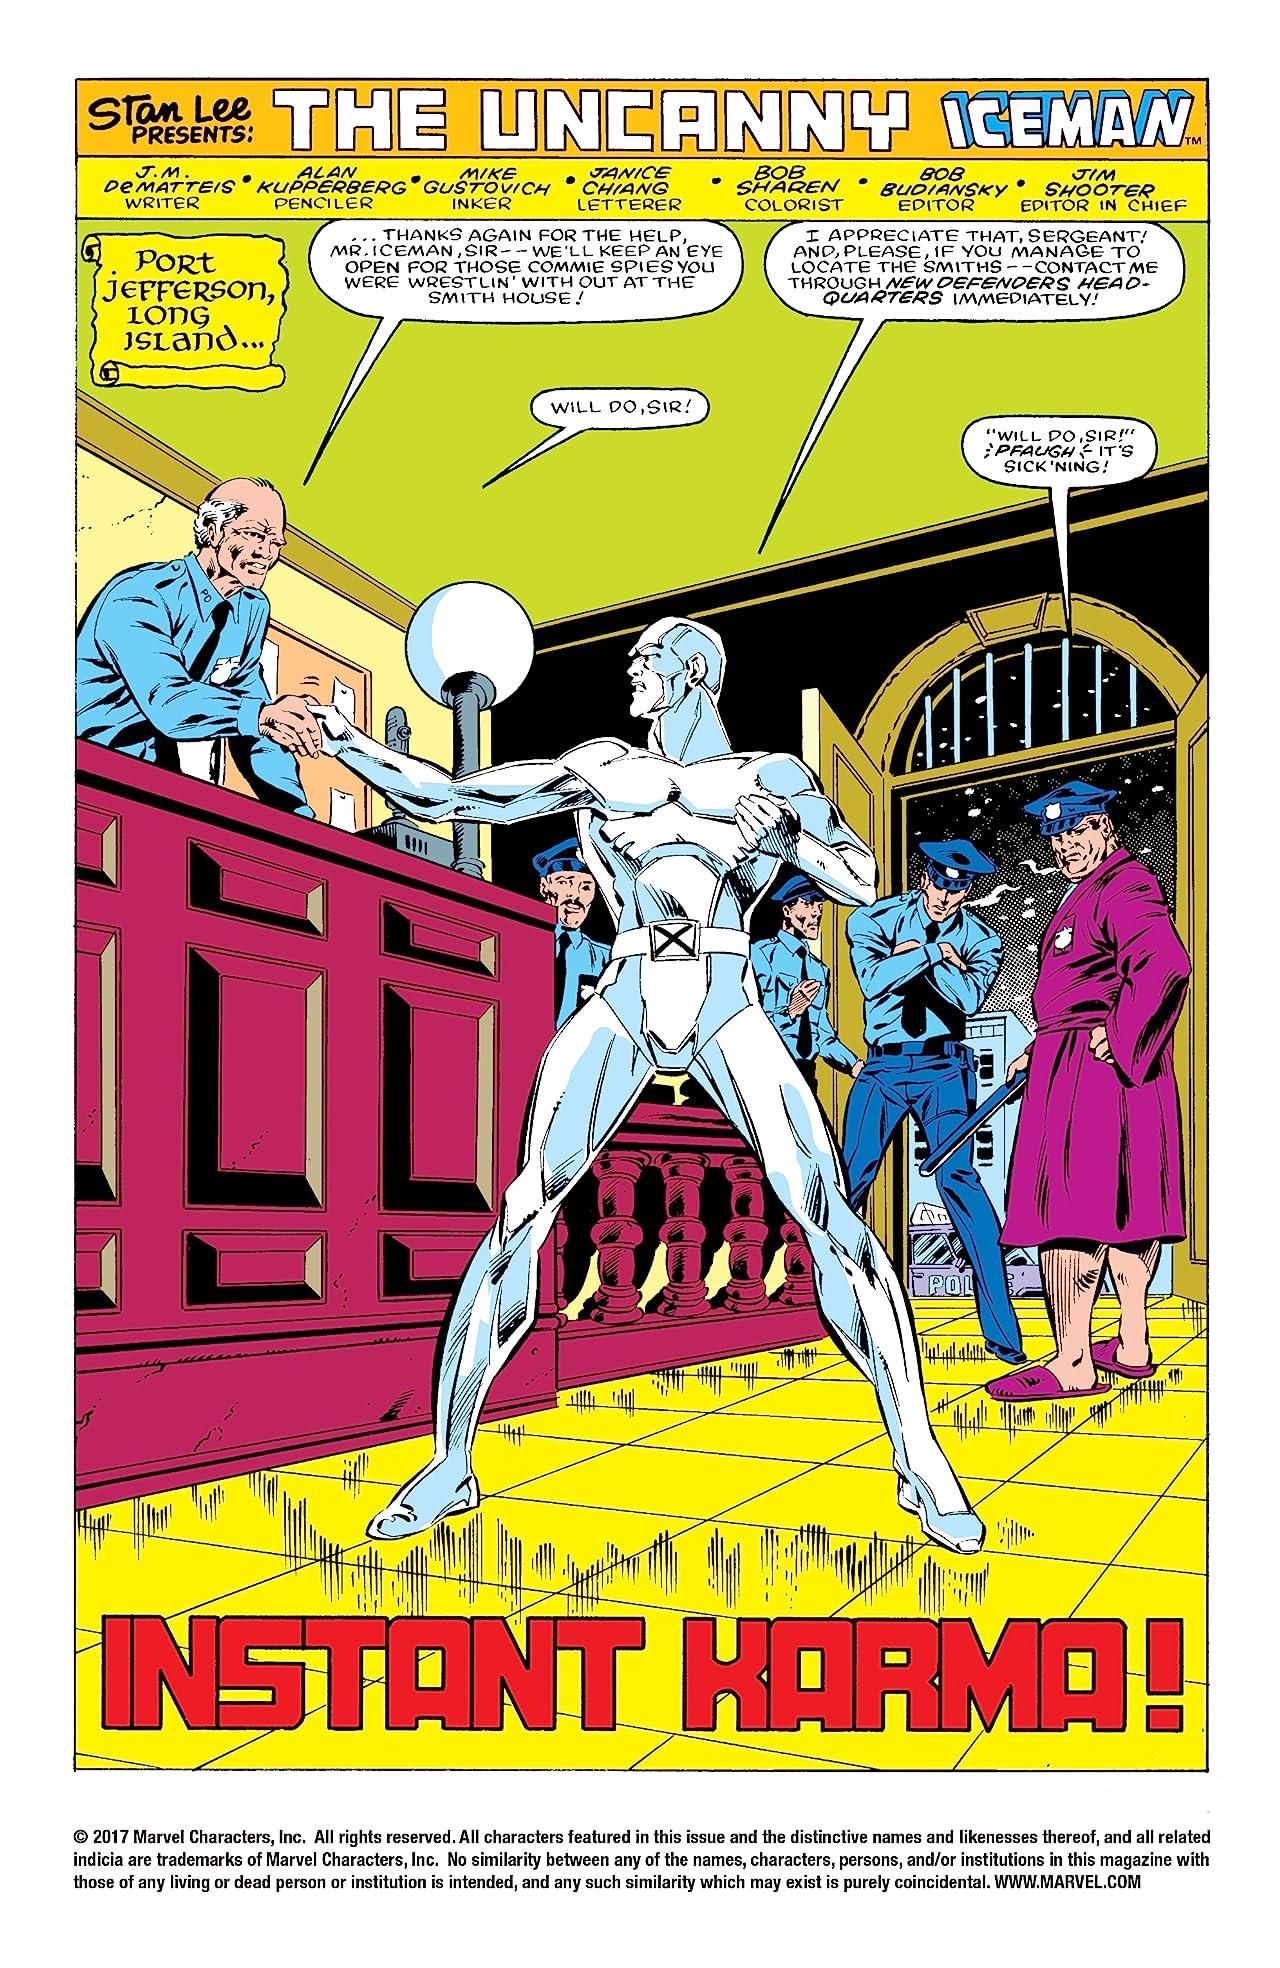 Iceman (1984) #2 (of 4)